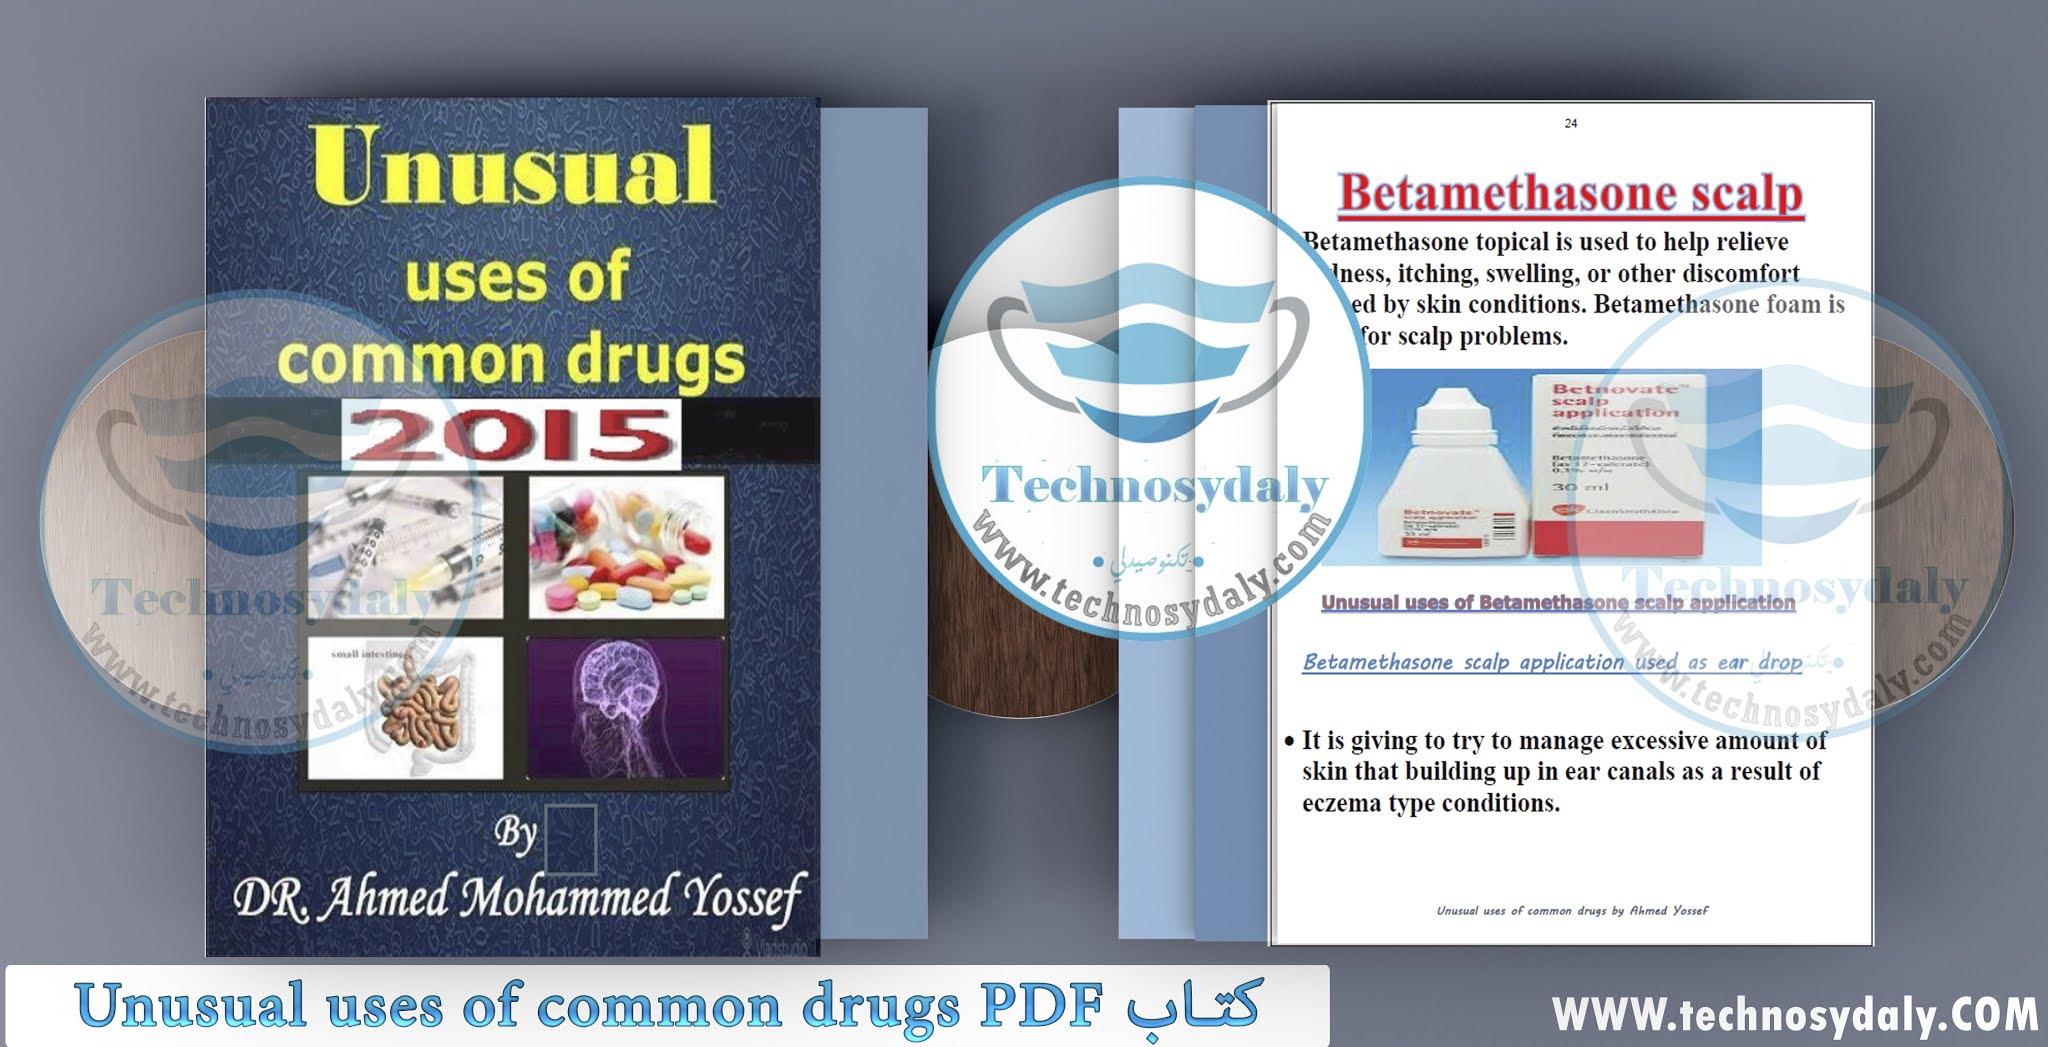 كتاب Unusual uses of common drugs PDF